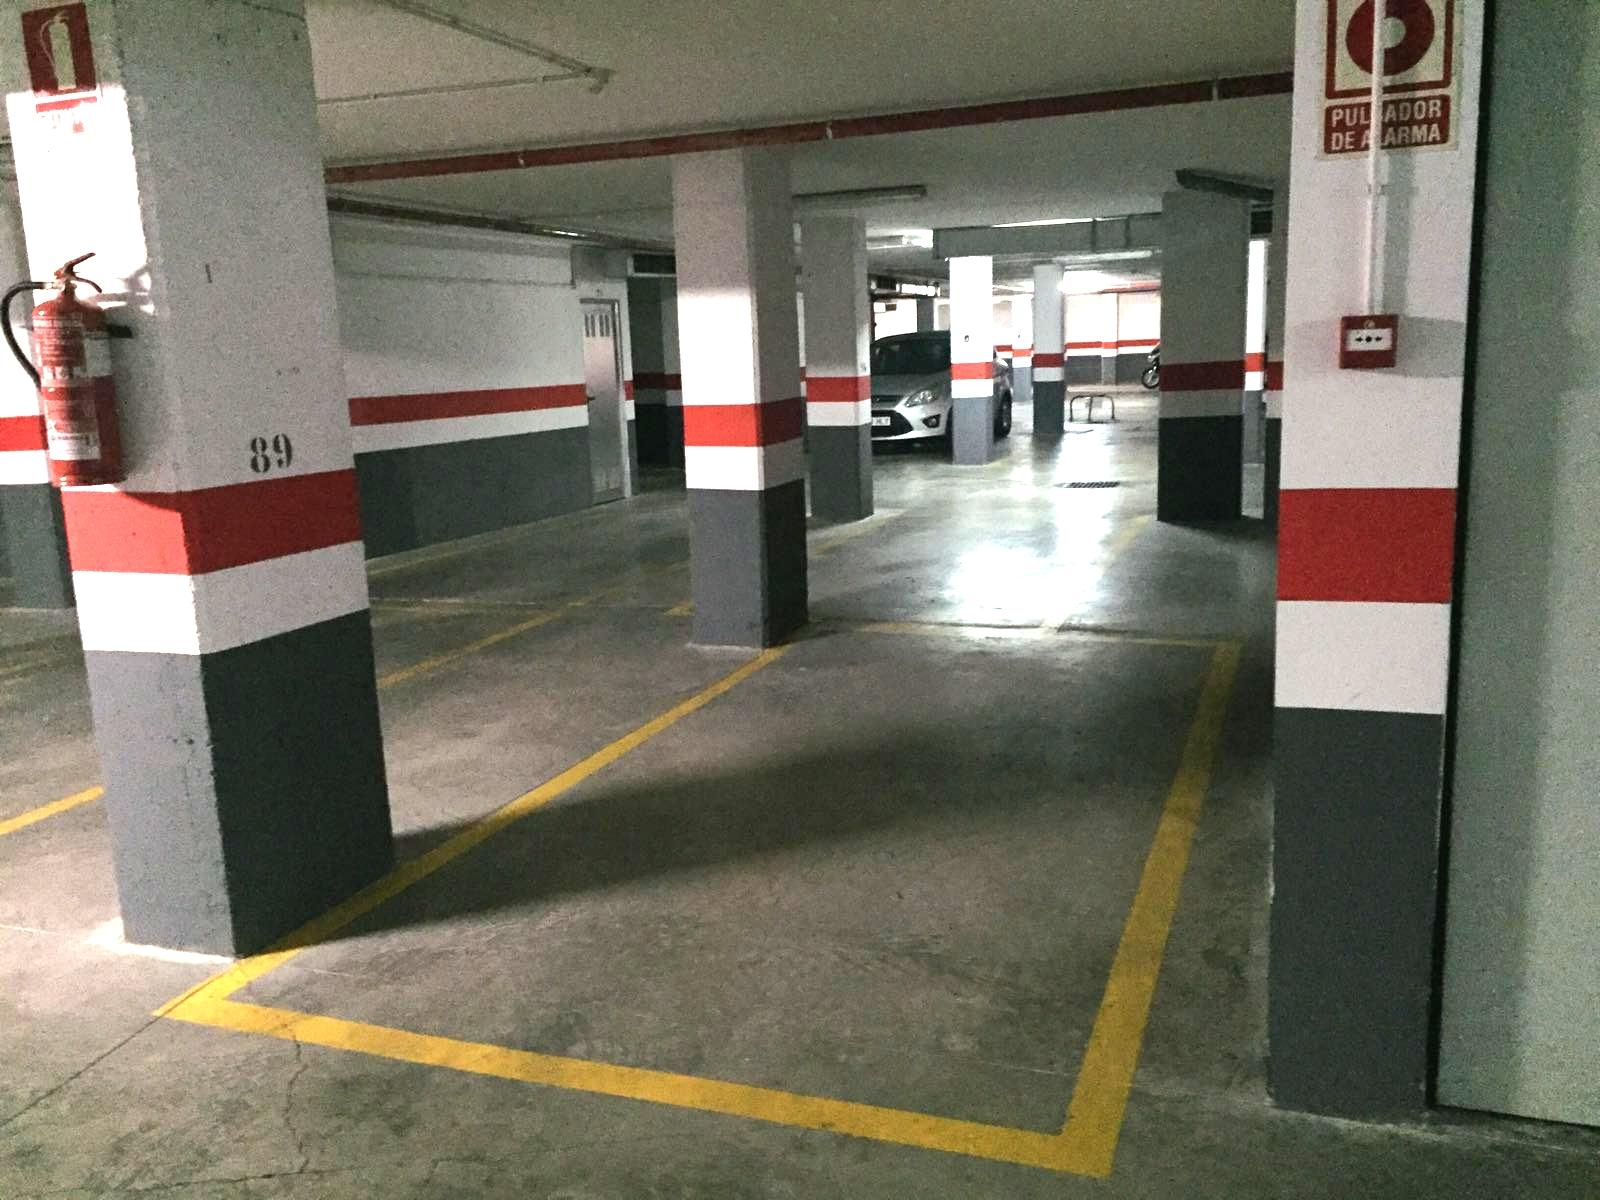 Garaje en Valencia (Plaza de garaje en Sant Pau, PK-89) - foto2